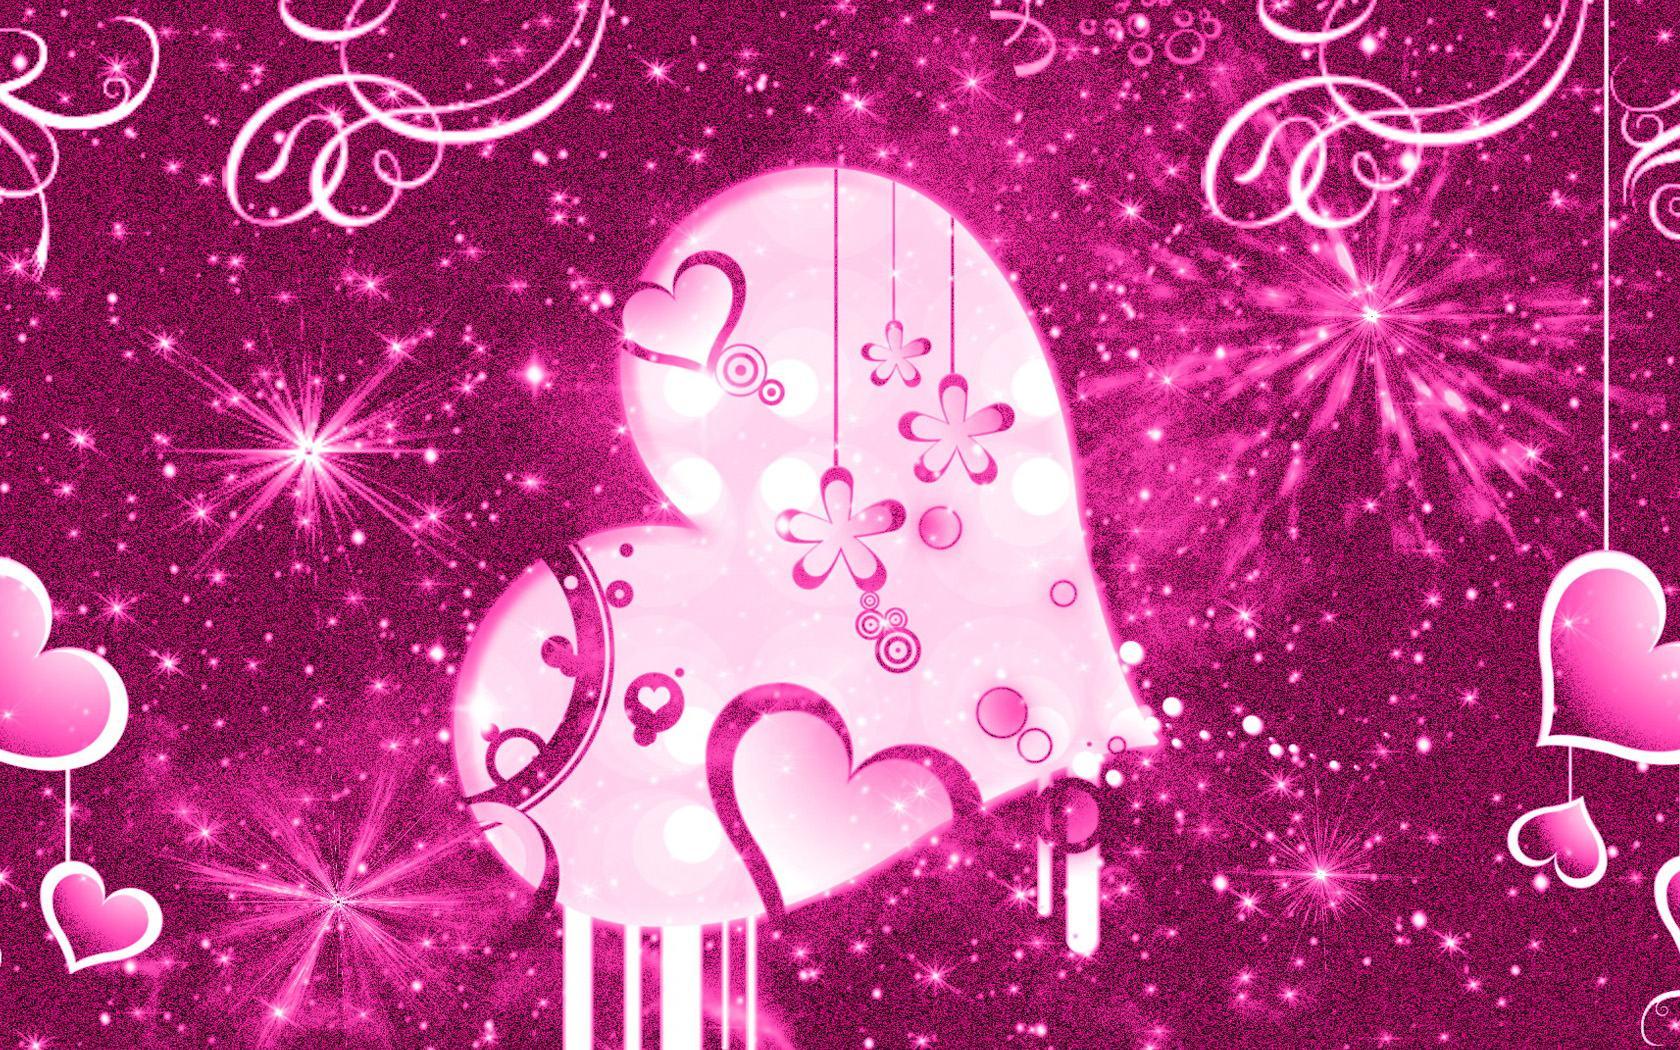 Cool Girly Wallpaper Pin pink hd wallpapers cute 1680x1050